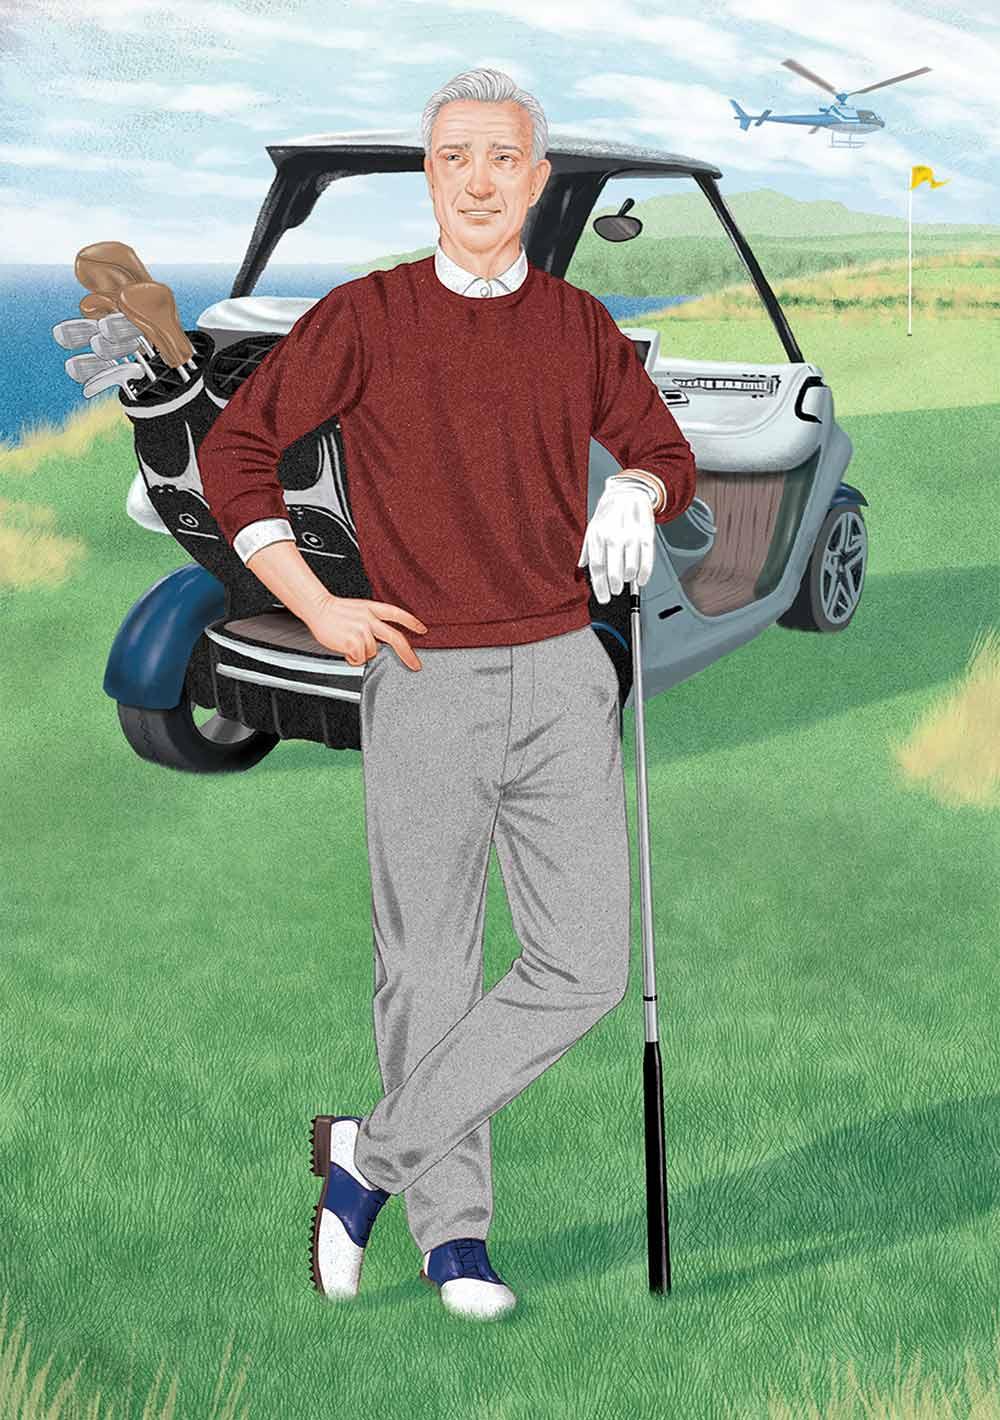 Rich golfer illustration